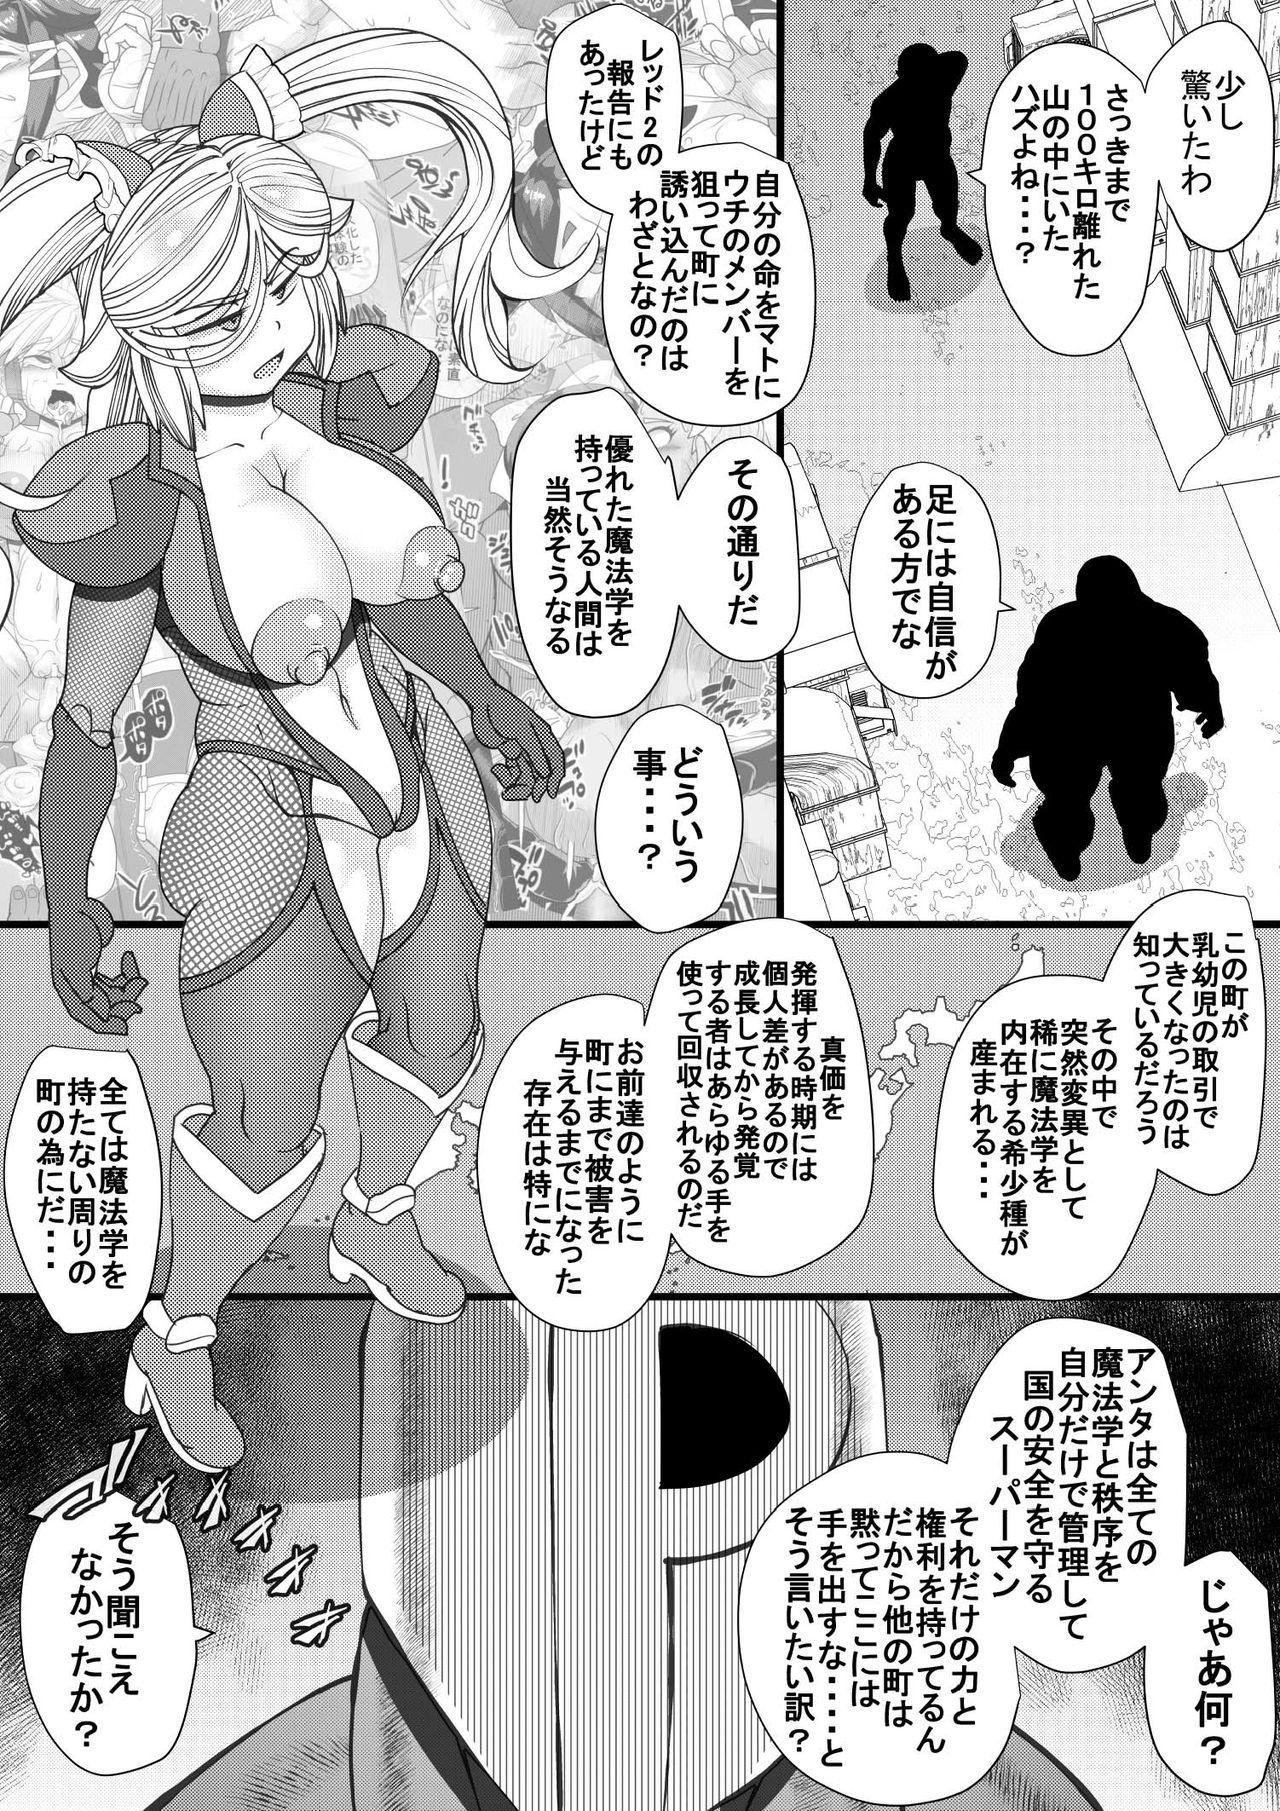 Haramachi 9 7